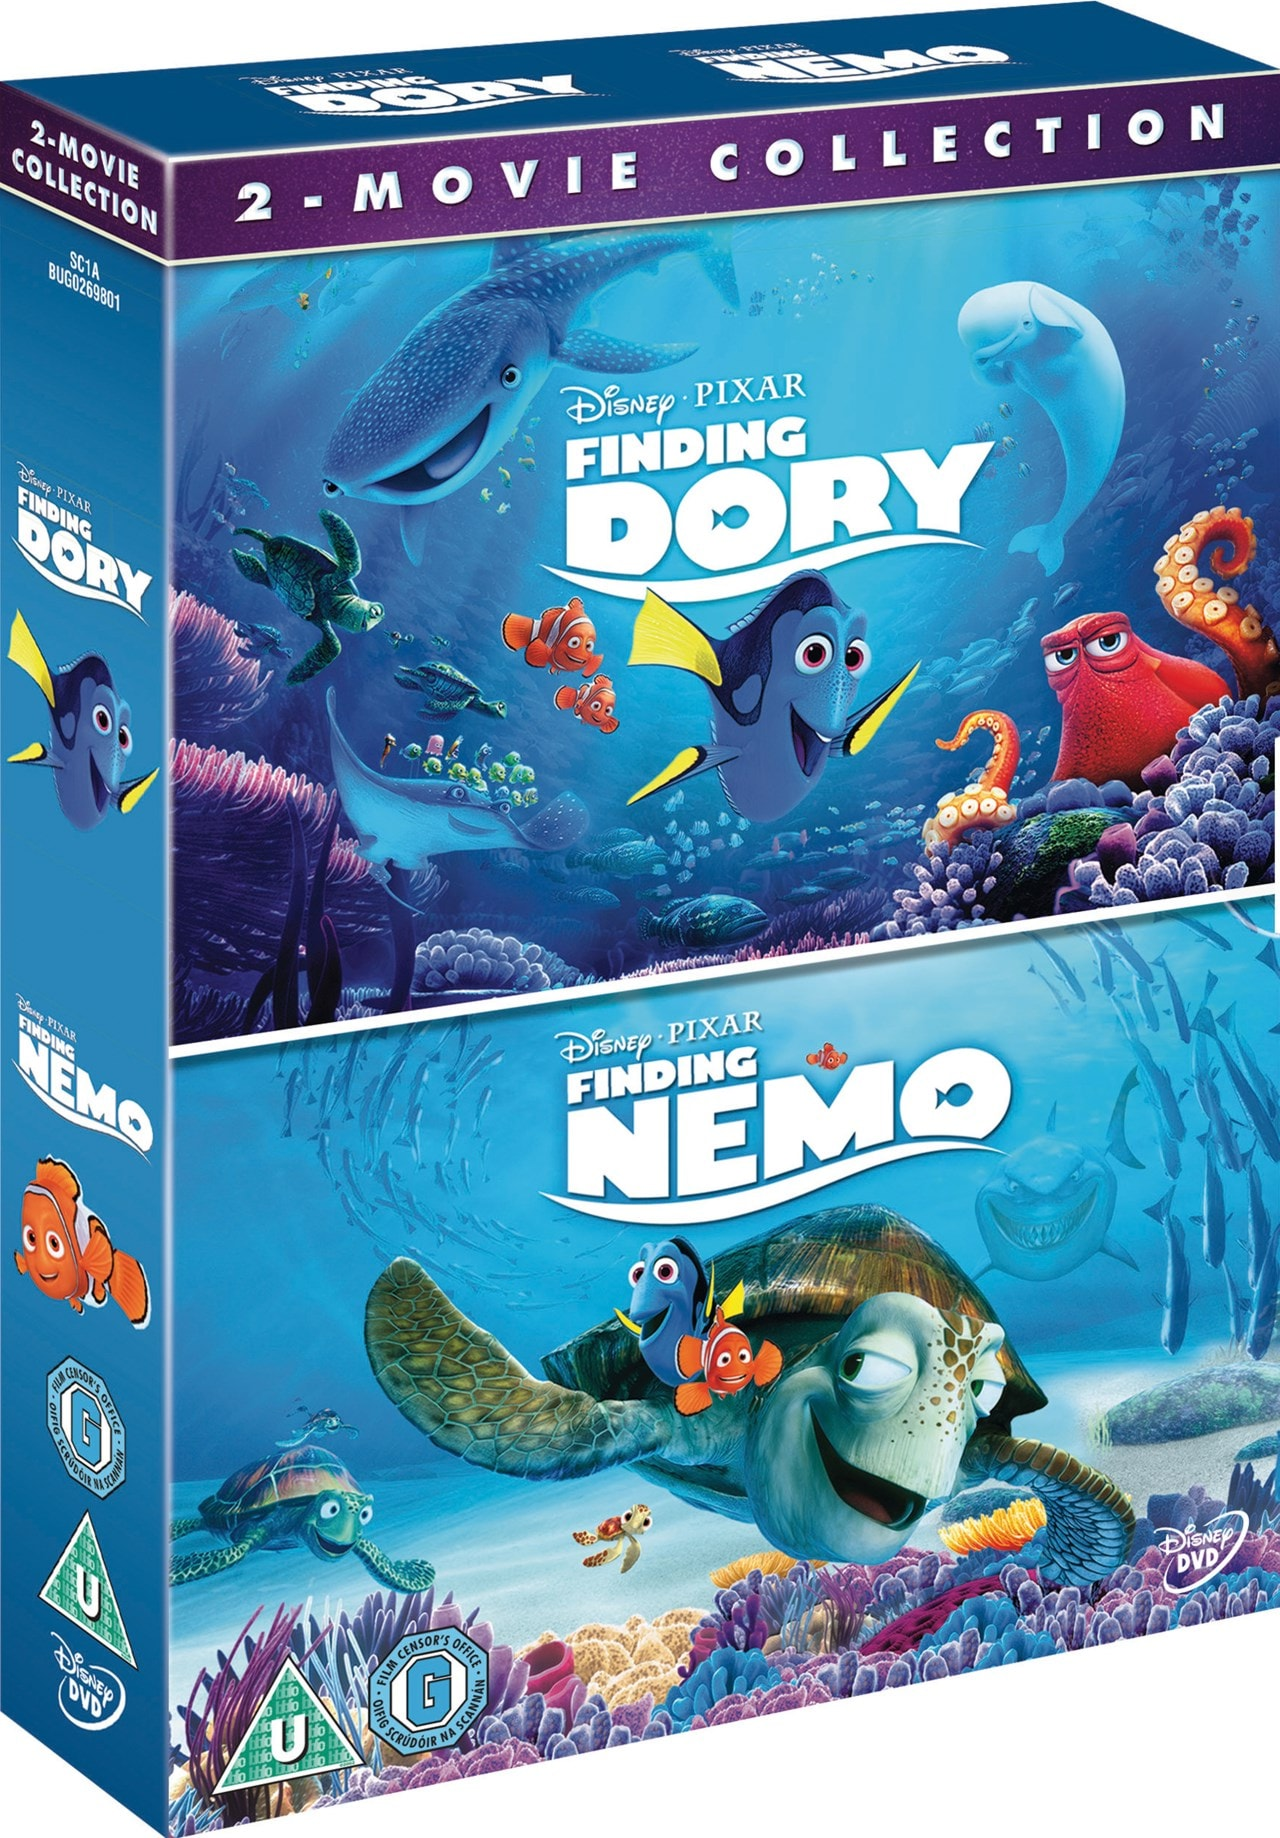 Finding Dory/Finding Nemo - 2